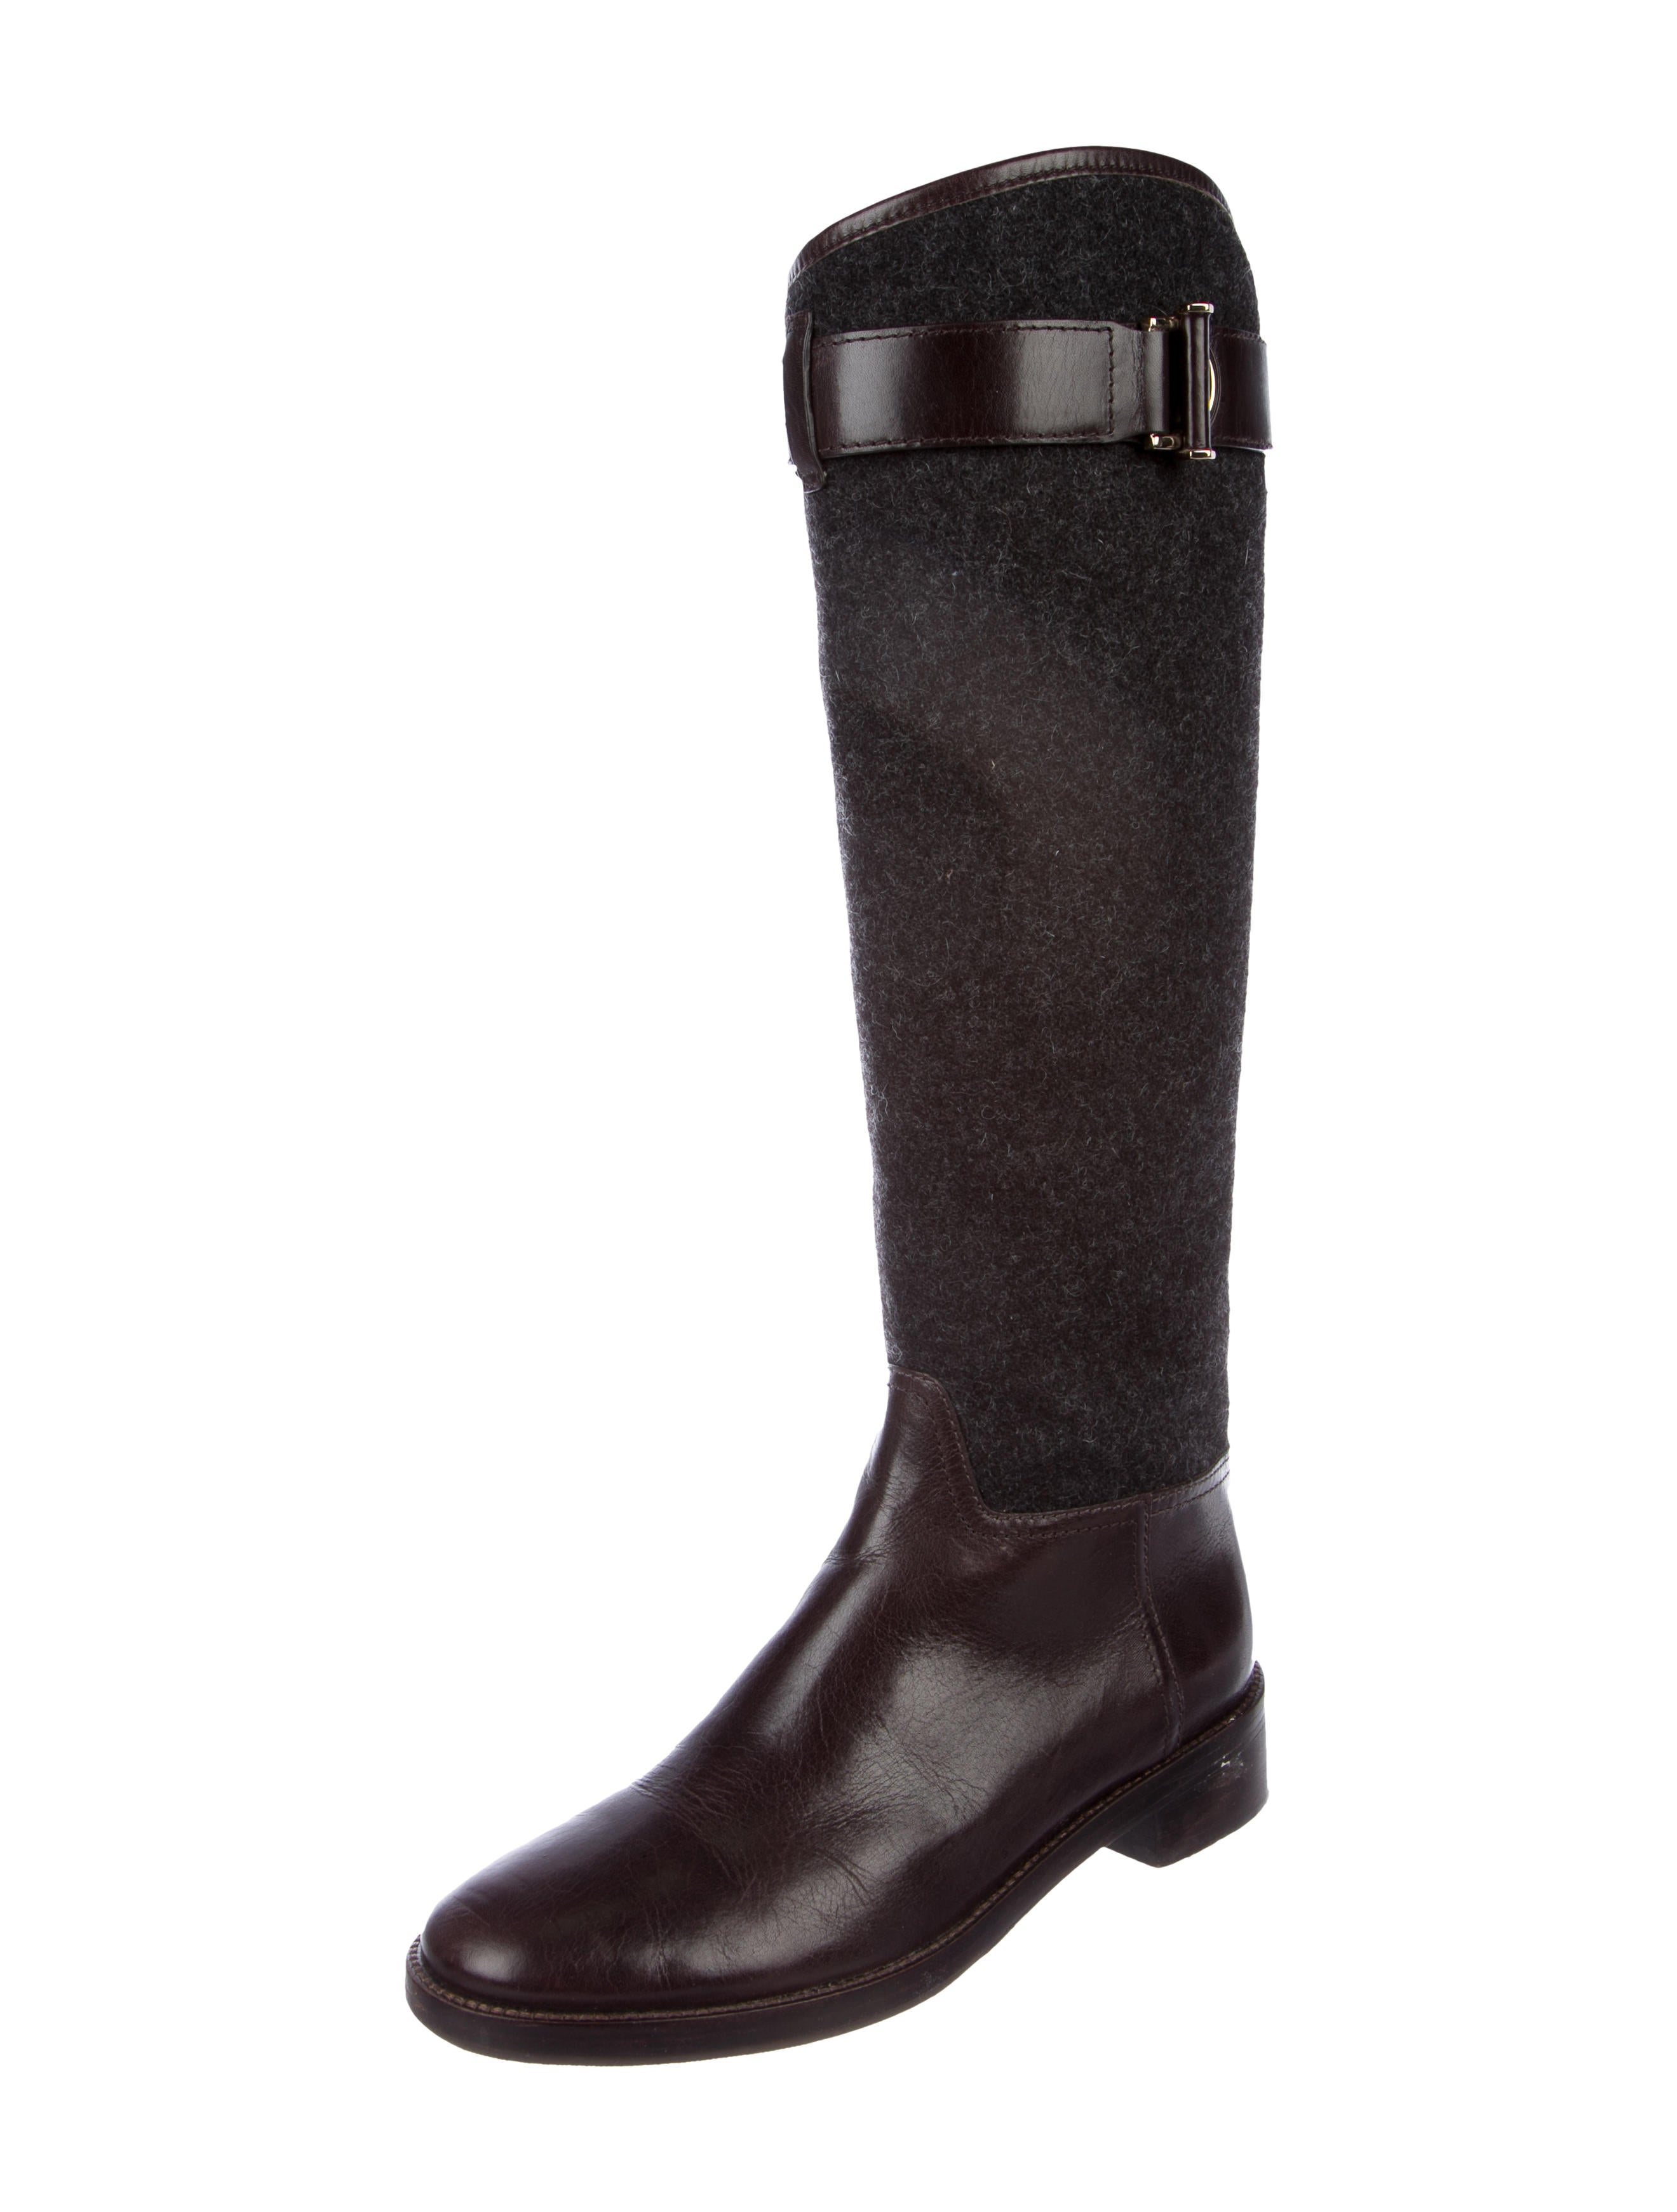 Tory Burch Felt Knee-High Boots 100% original cheap price footaction BI9rts6tH